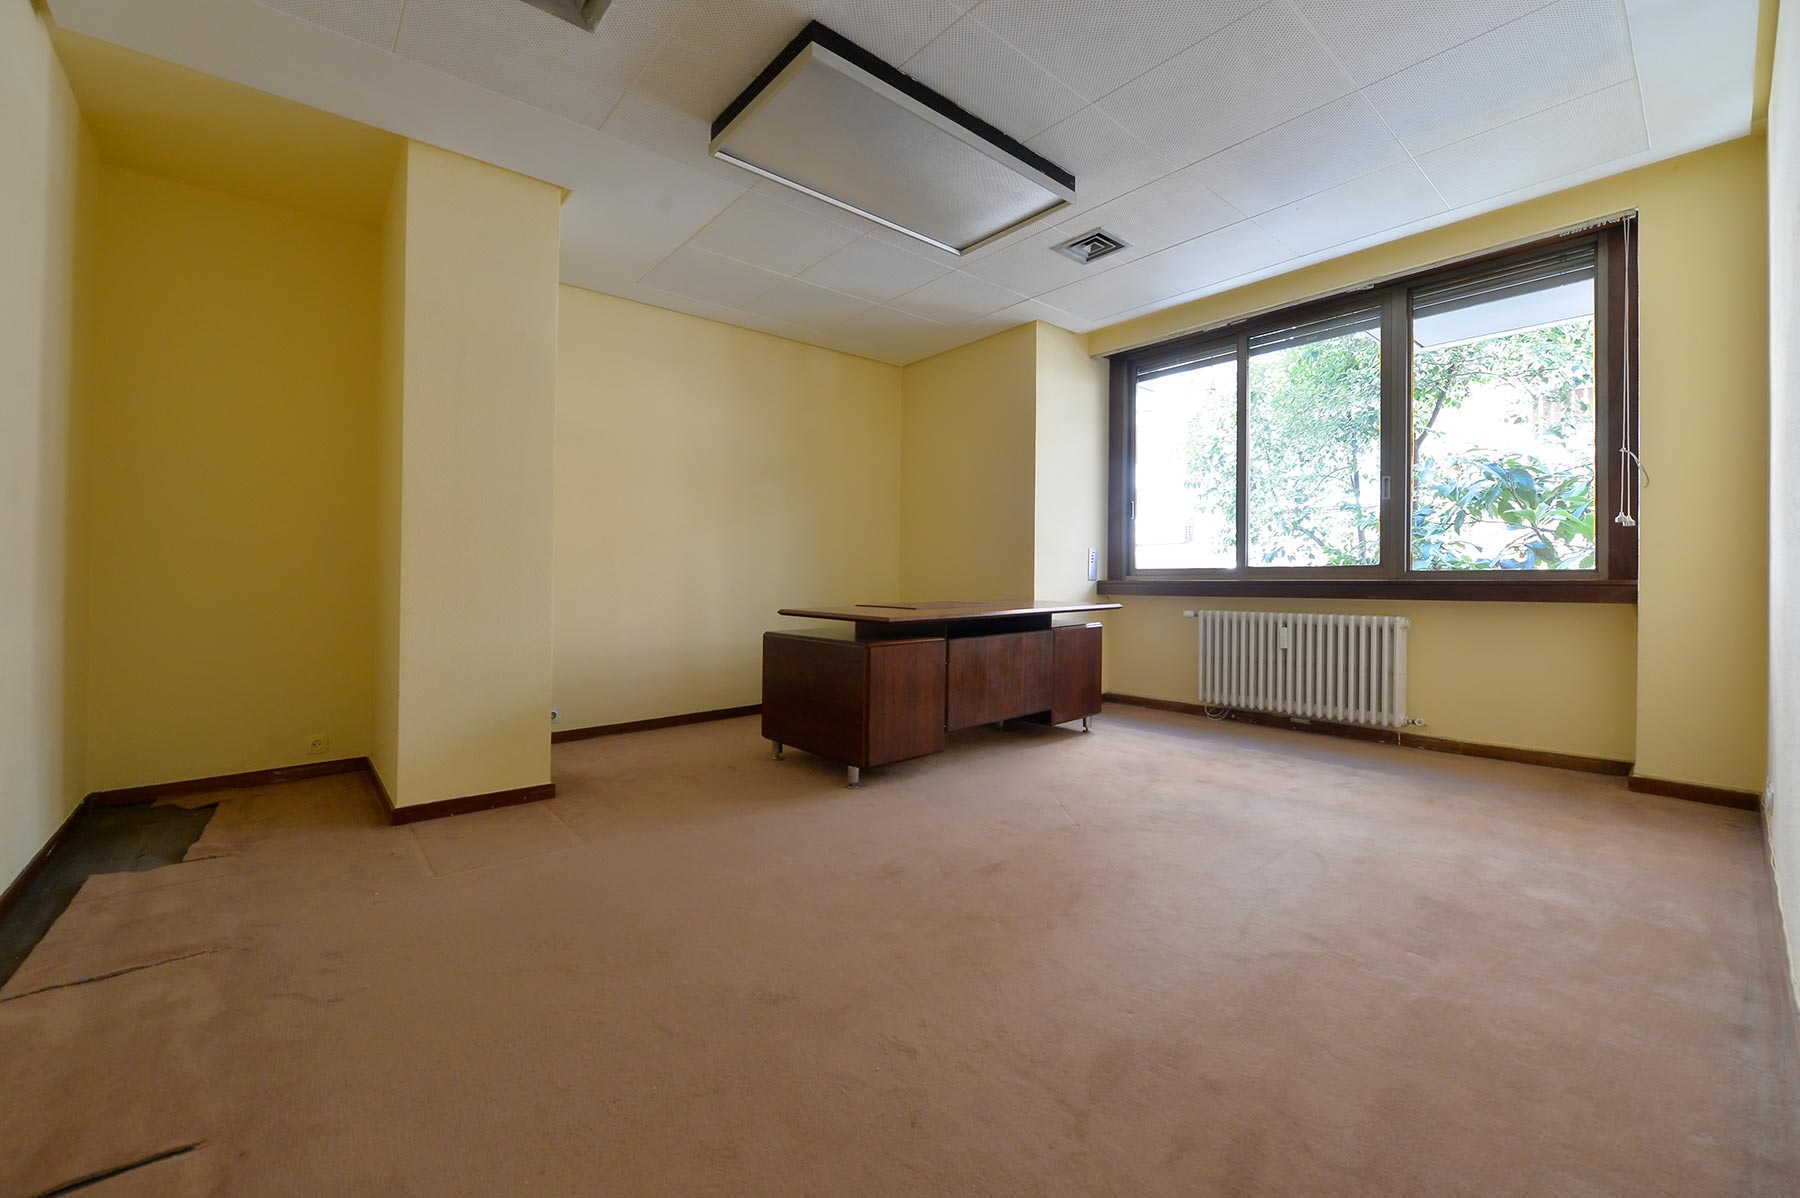 獨棟家庭住宅 為 出售 在 Excellent apartment with two parking spaces Nuñez de Balboa Madrid, 馬德里, 28001 西班牙